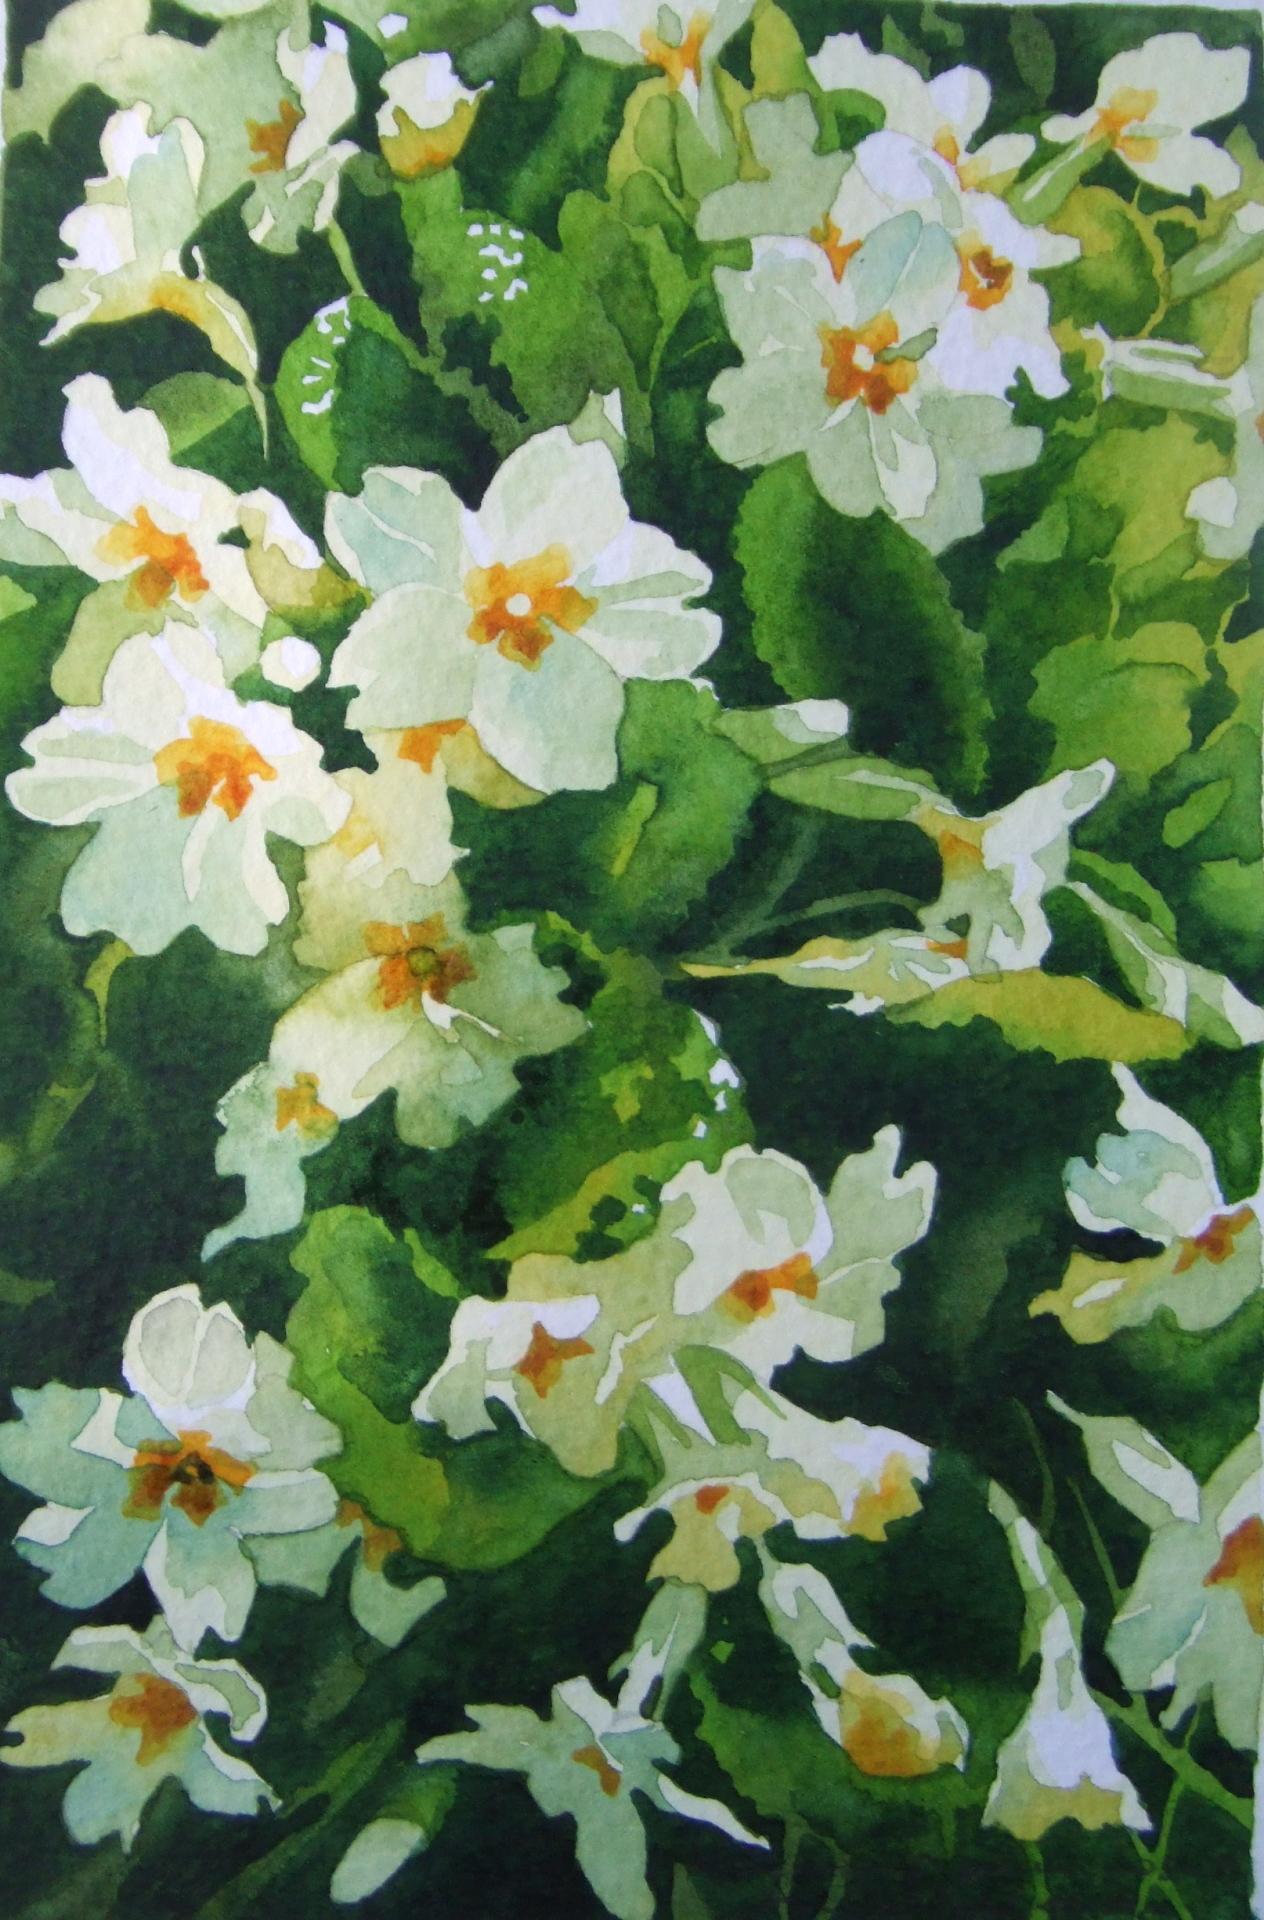 Early morning primroses